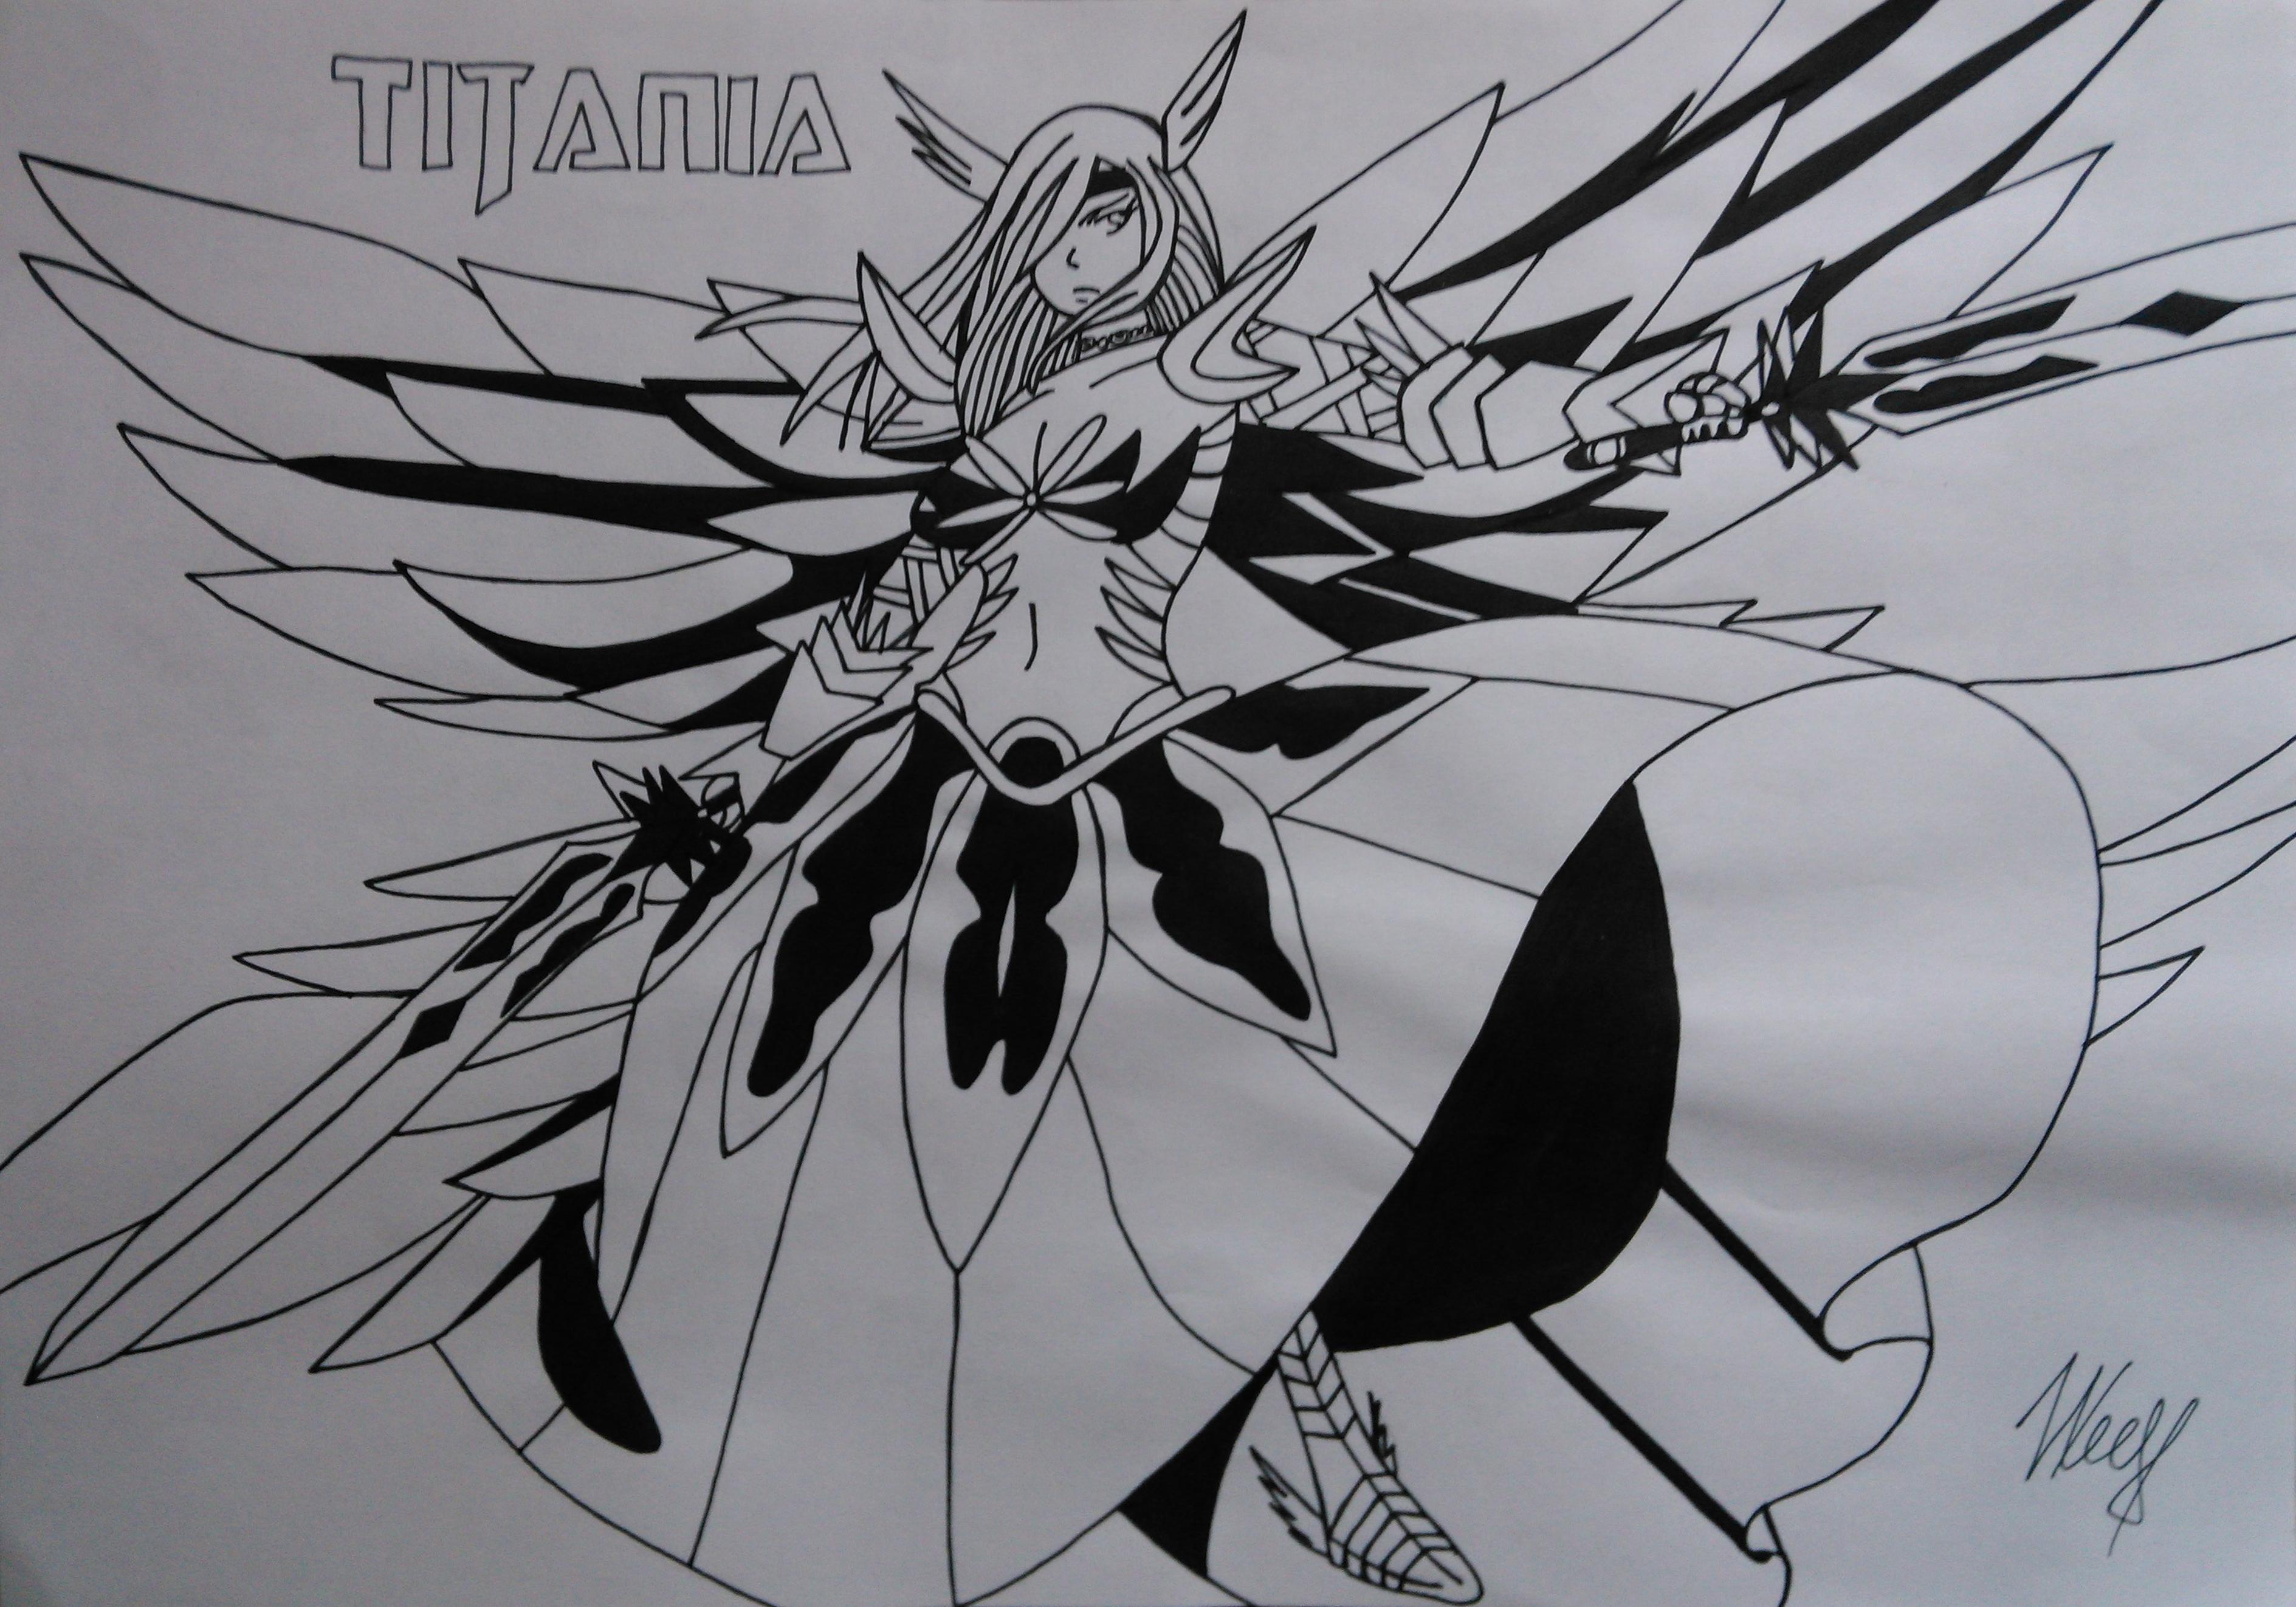 Erza Scarlet, Titania - Fairy Tail by mishoka303 on DeviantArt